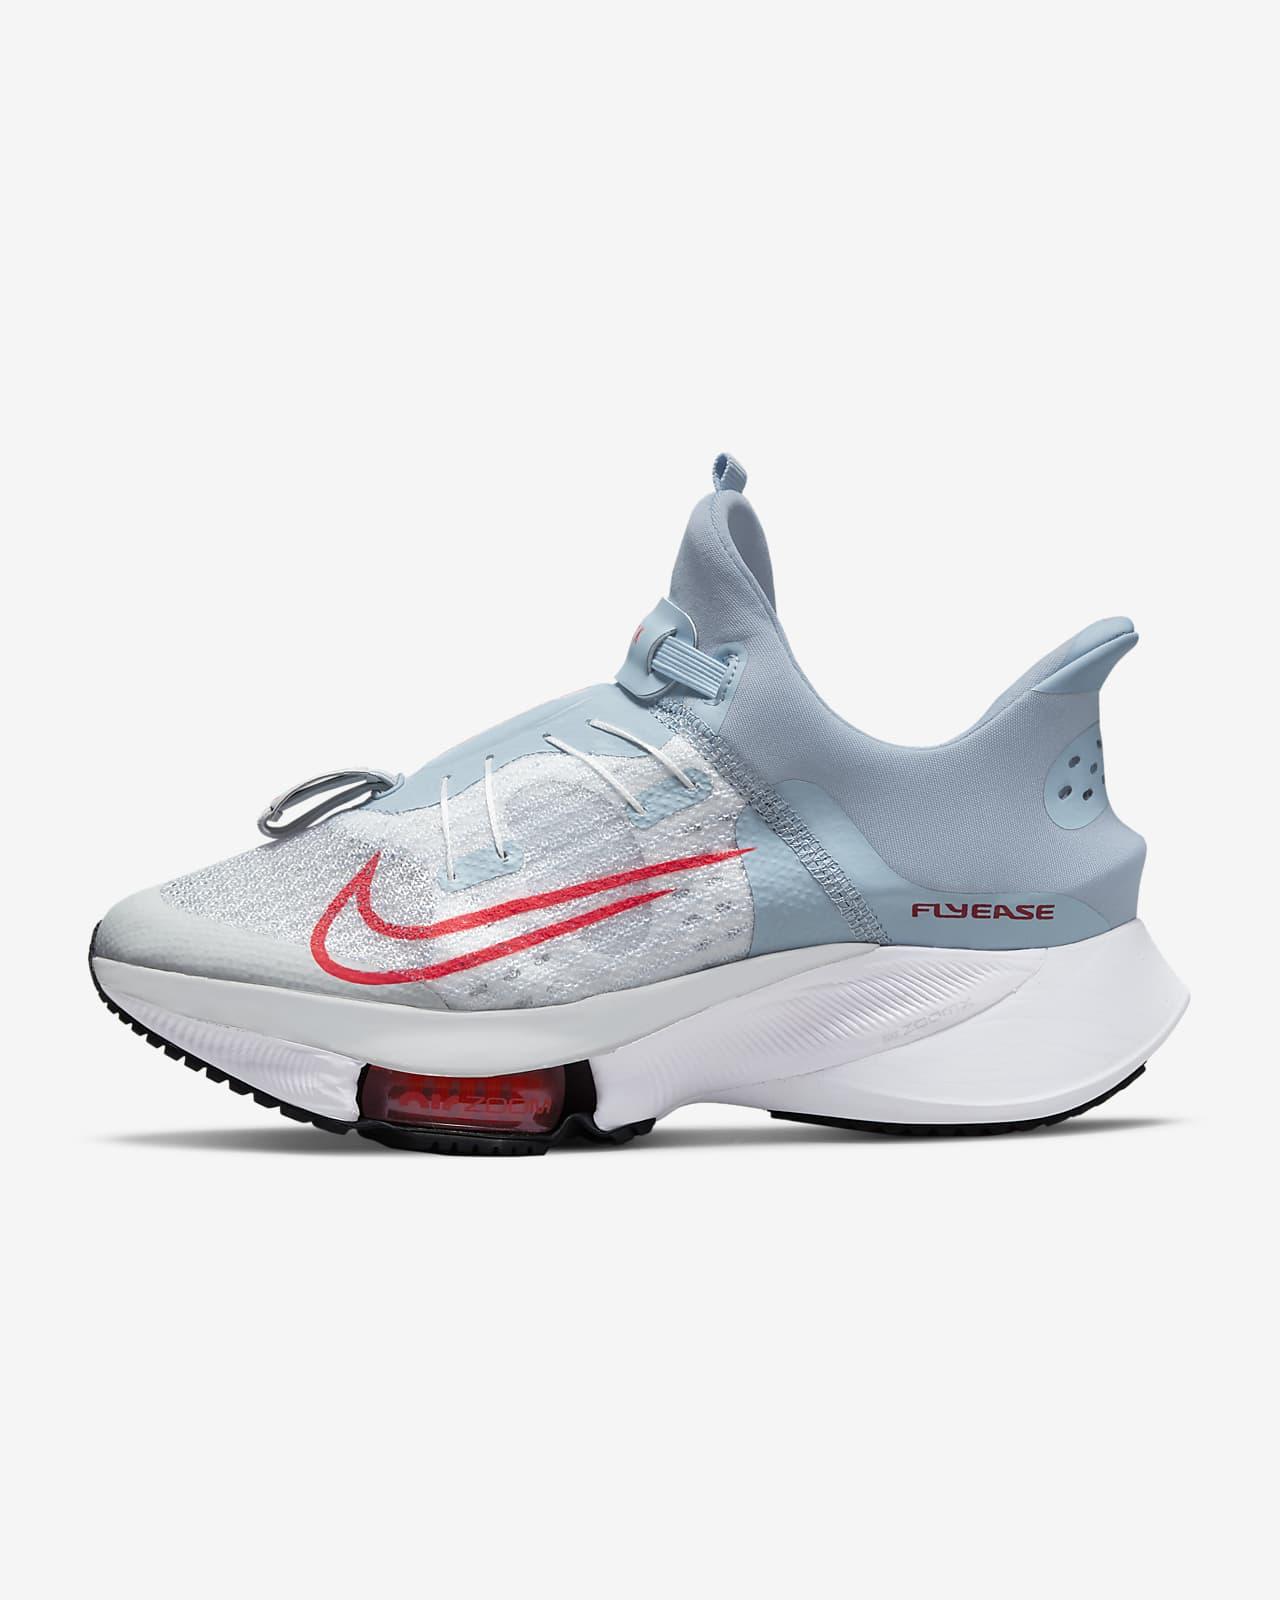 Nike Air Zoom Tempo NEXT% FlyEase Damen-Laufschuh